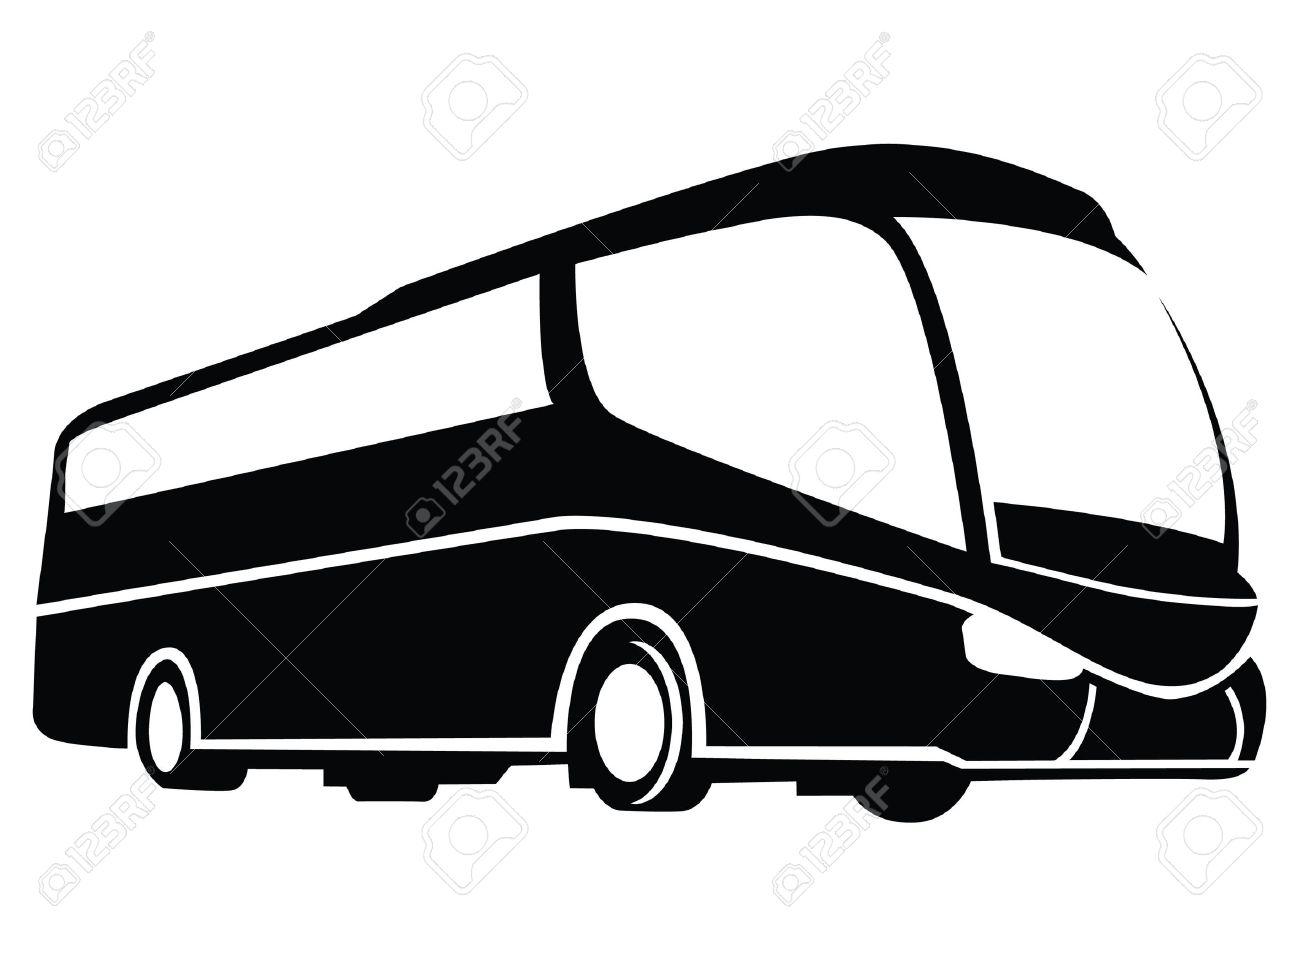 bus symbol royalty free cliparts vectors and stock illustration rh 123rf com bus victorville ca bus victoria island